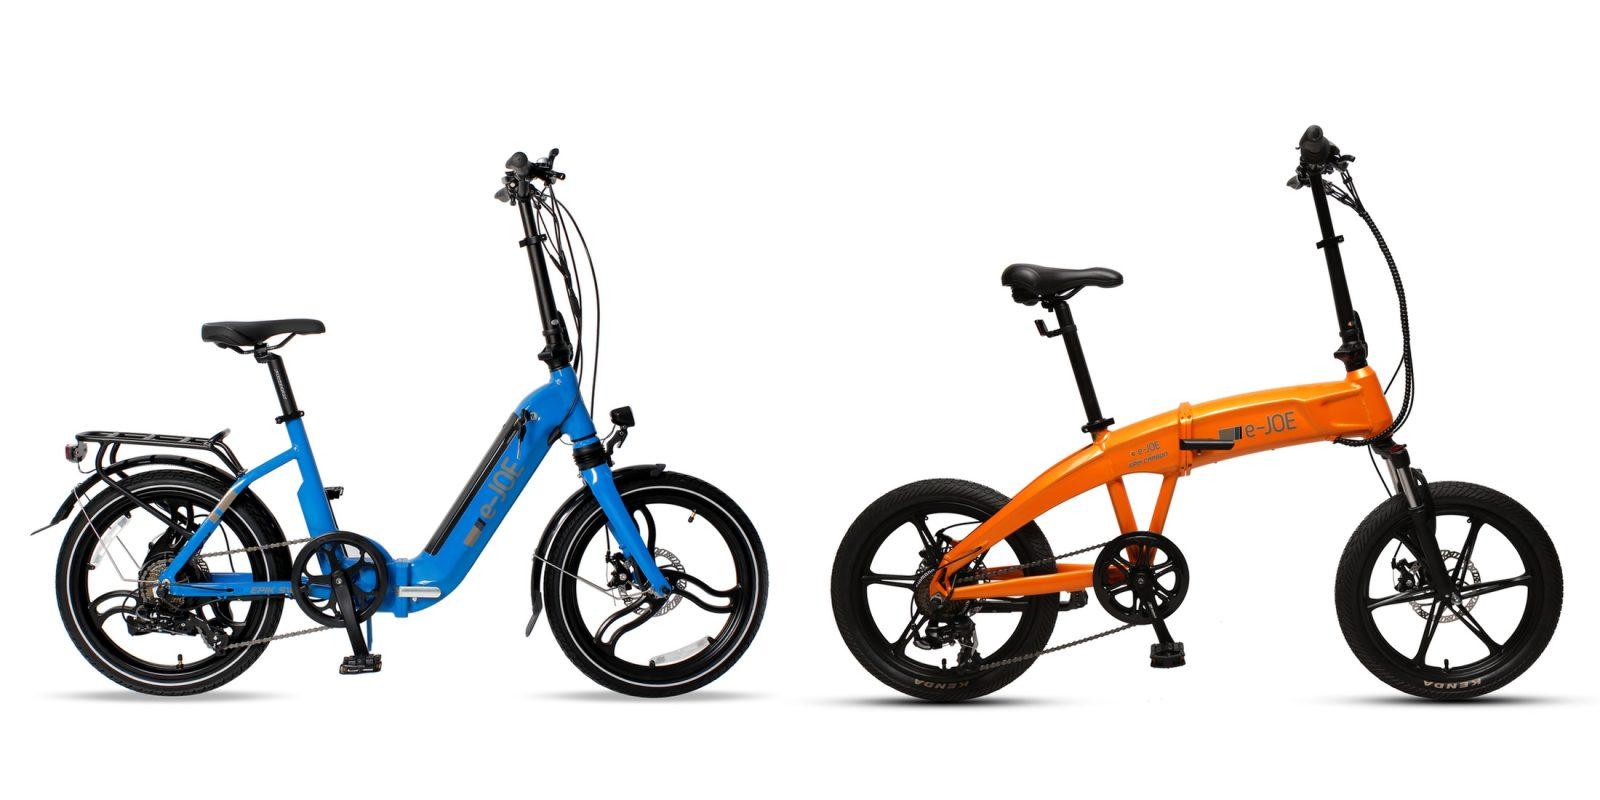 Two new folding e-bikes from e-JOE boast 40 miles of range and start at $1,399